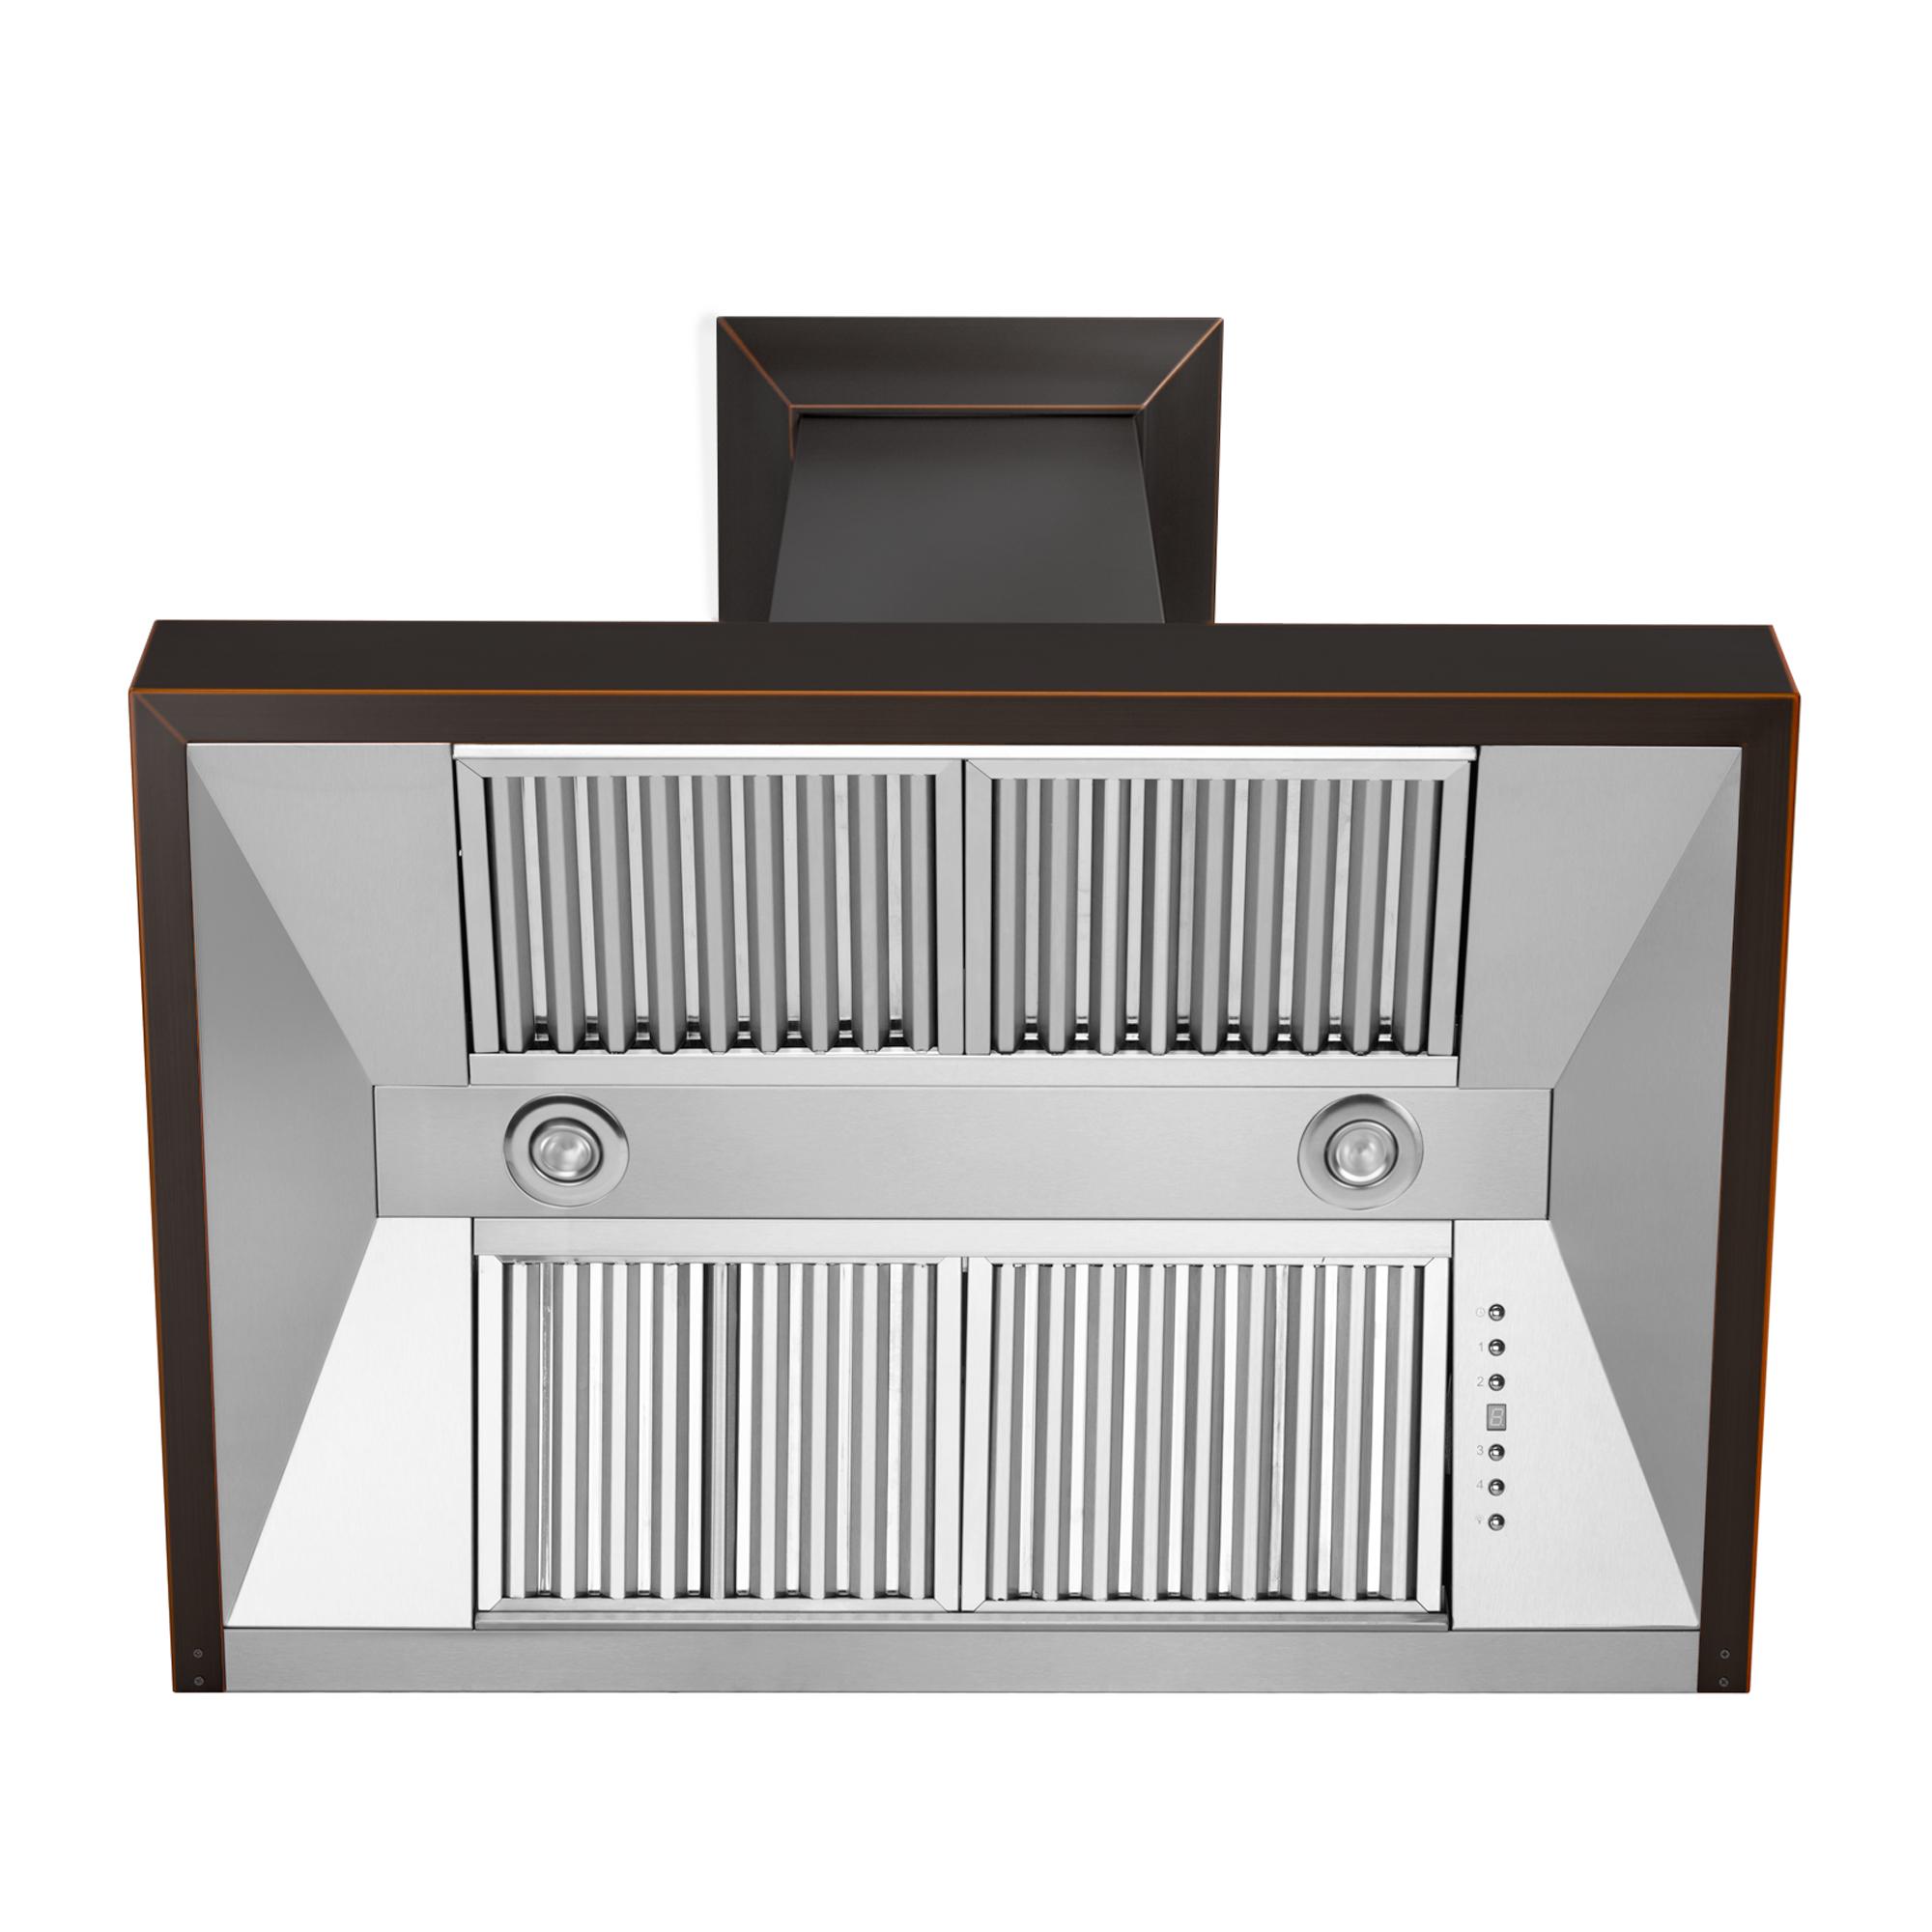 zline-bronze-wall-mounted-range-hood-8632B-kitchen-2-wb.jpg